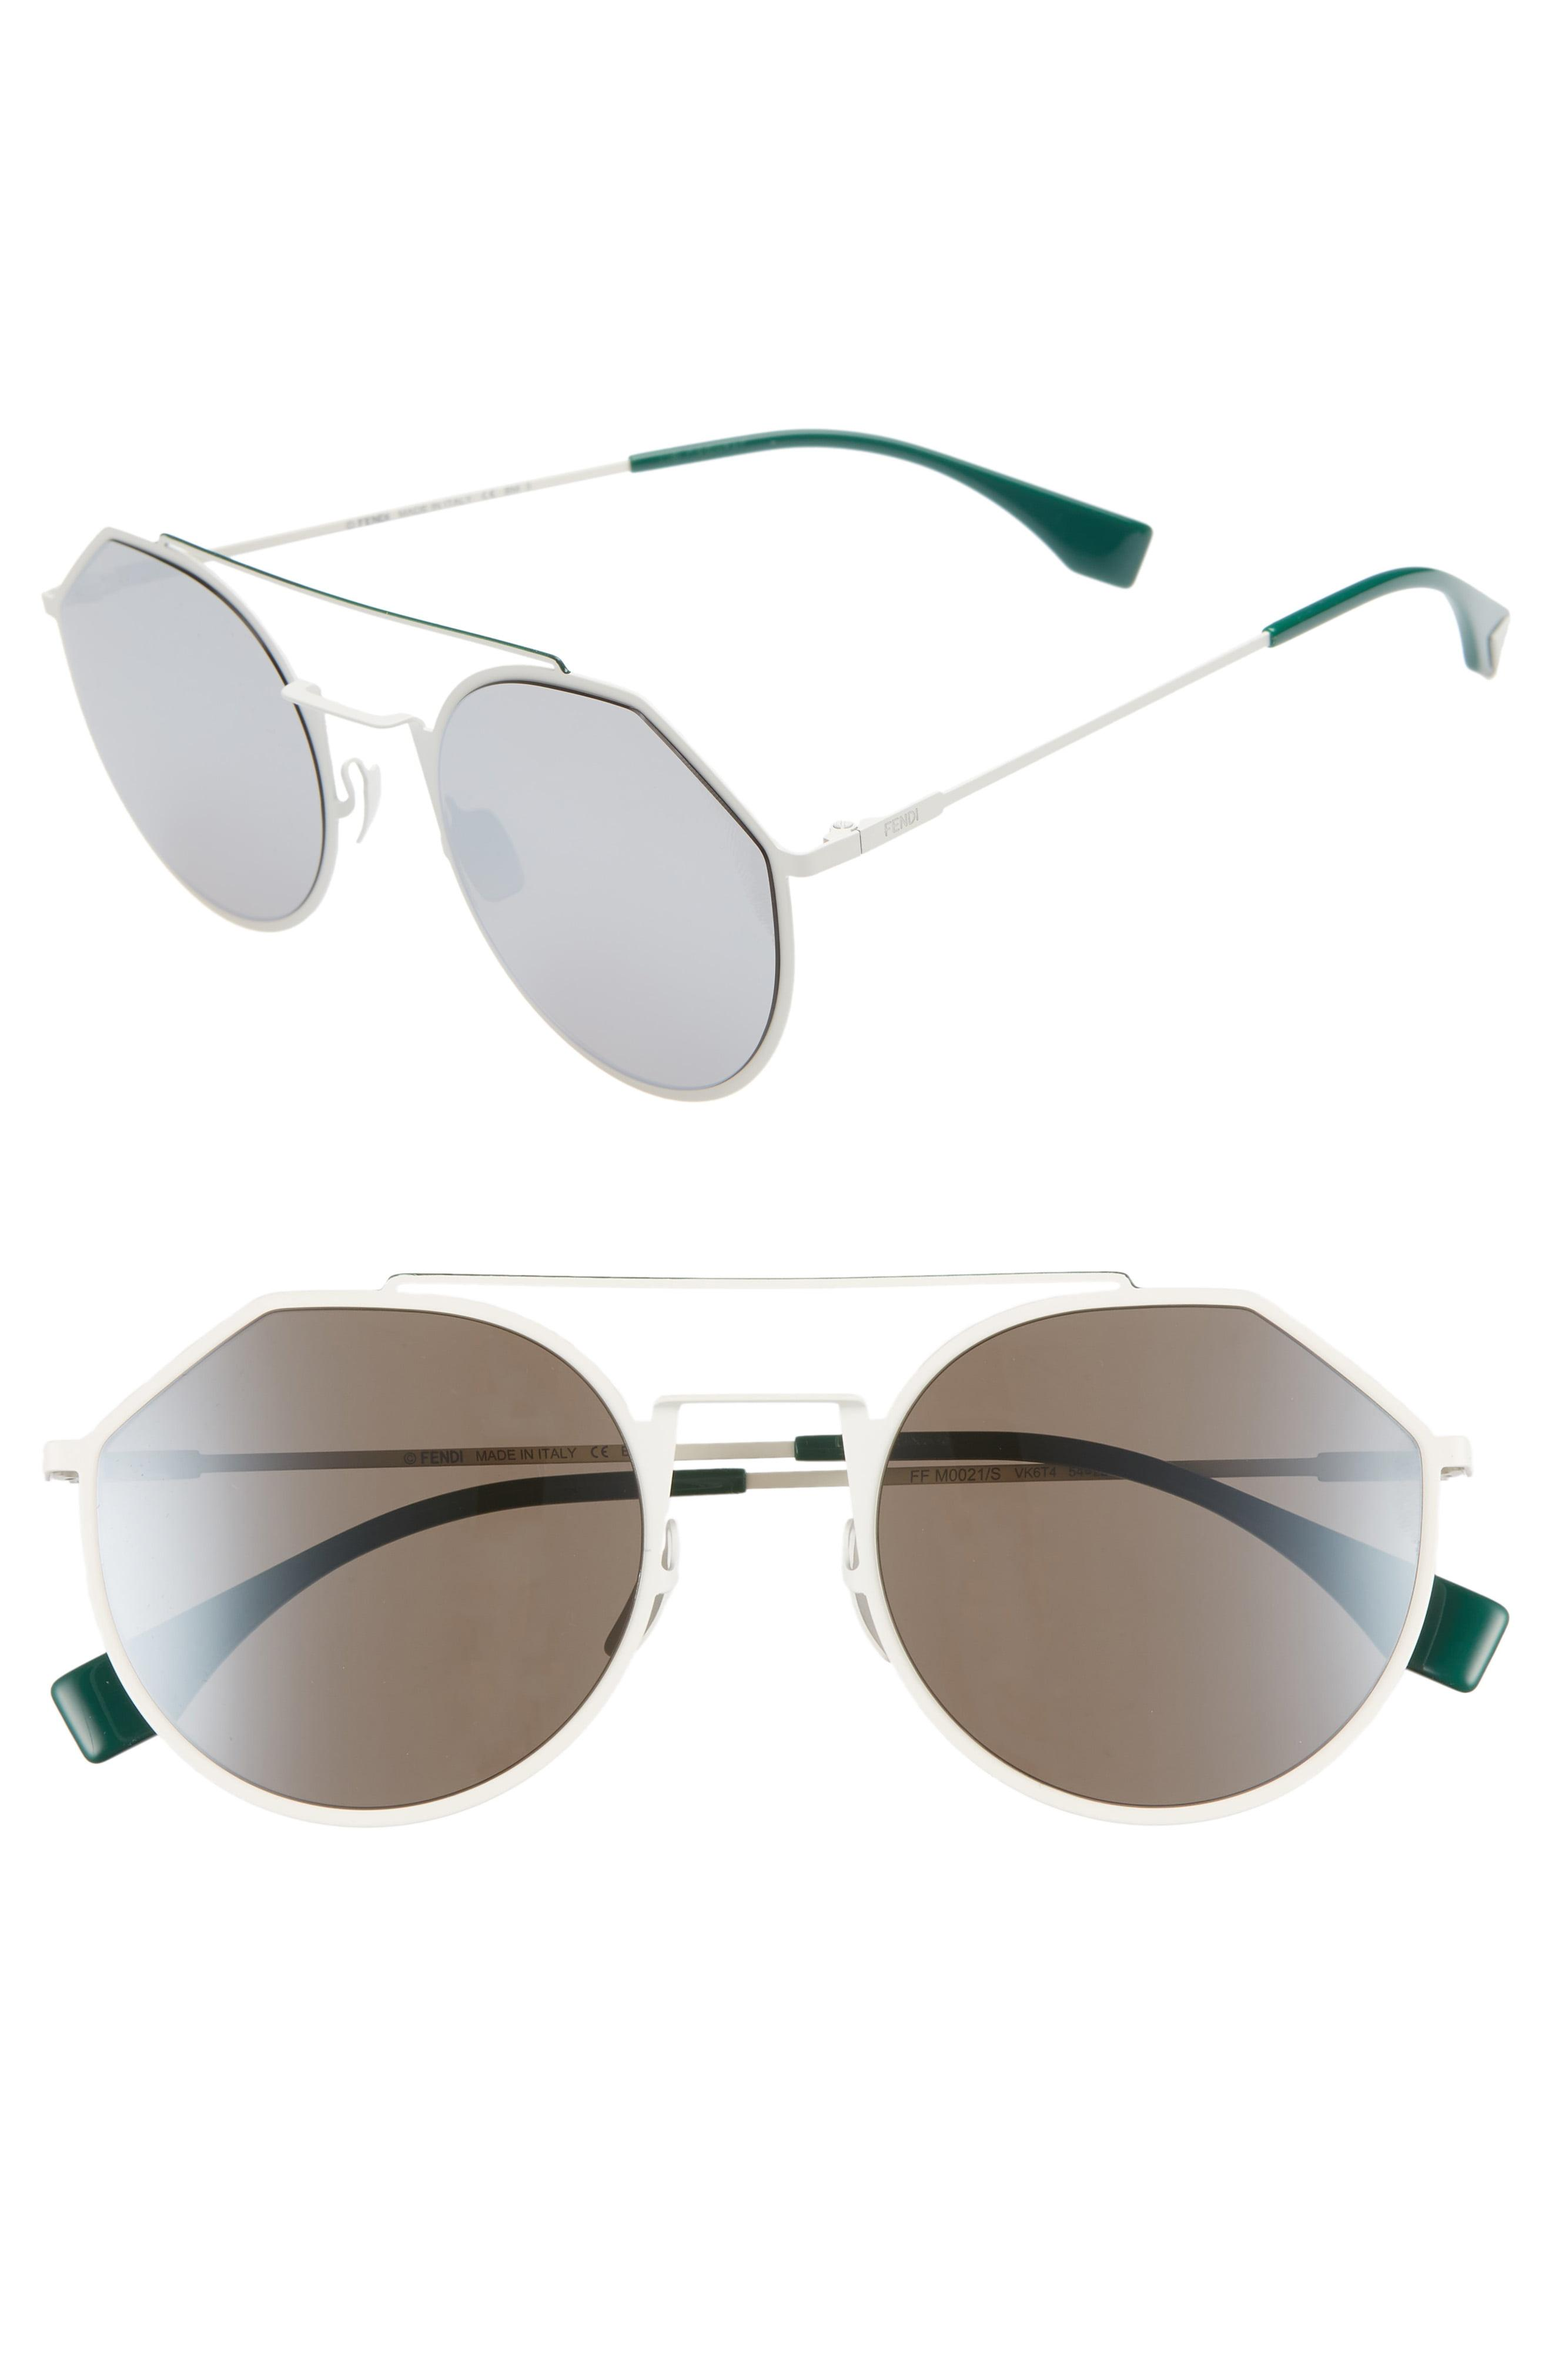 87f6f5b0c57 Lyst - Fendi 54mm Round Sunglasses - for Men